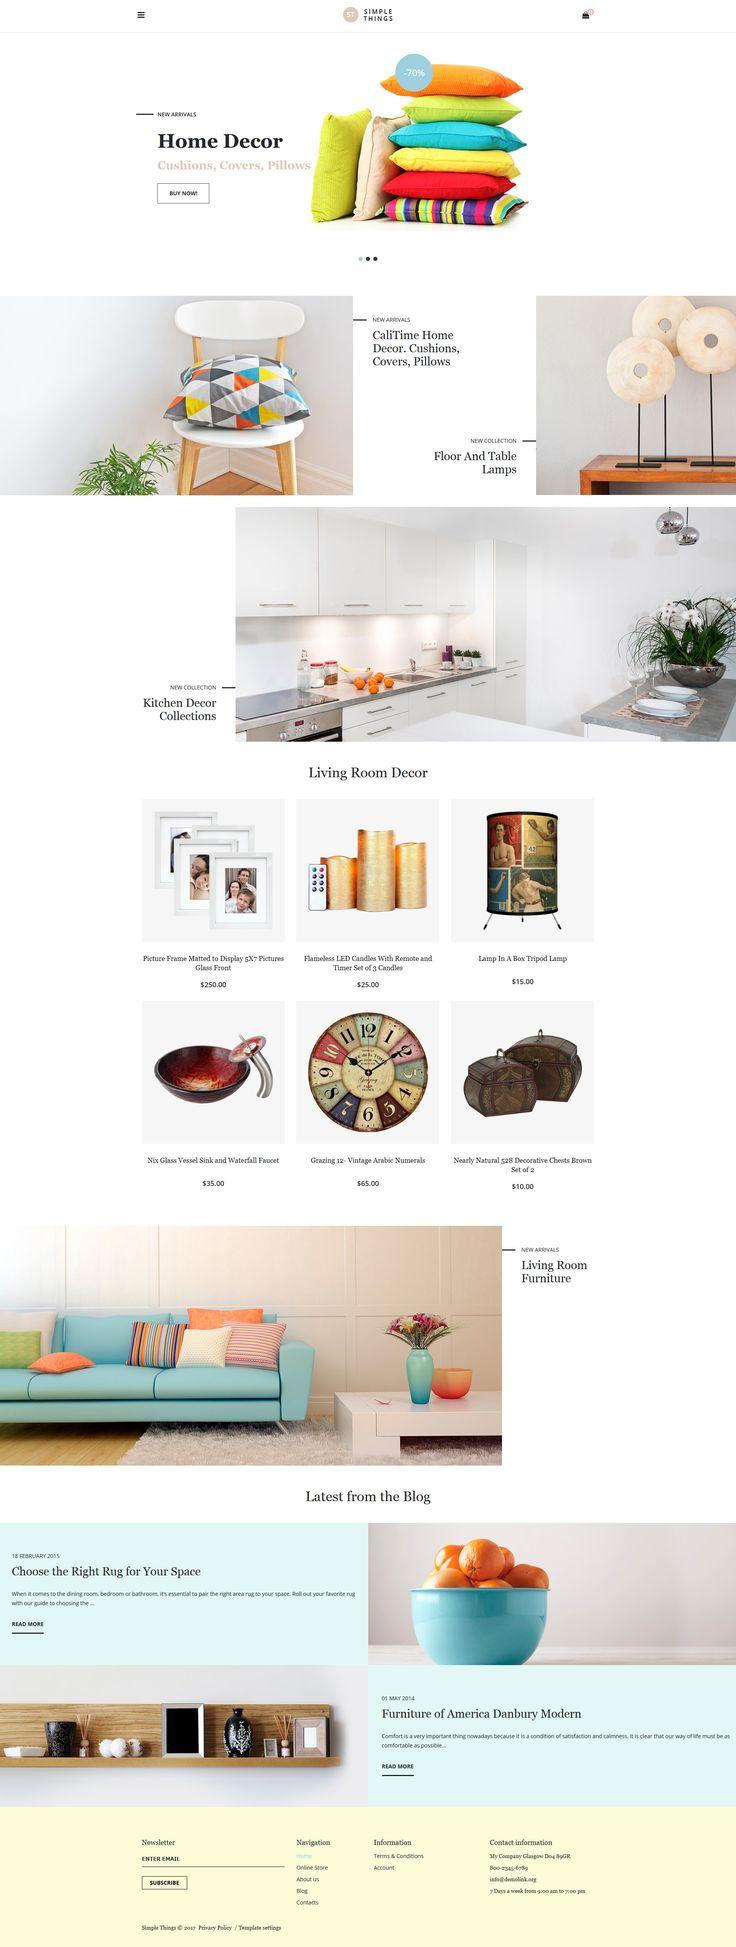 Home Decor Responsive VirtueMart Template #62131 - https://www.templatemonster.com/virtuemart-templates/home-decor-responsive-virtuemart-template-62131.html